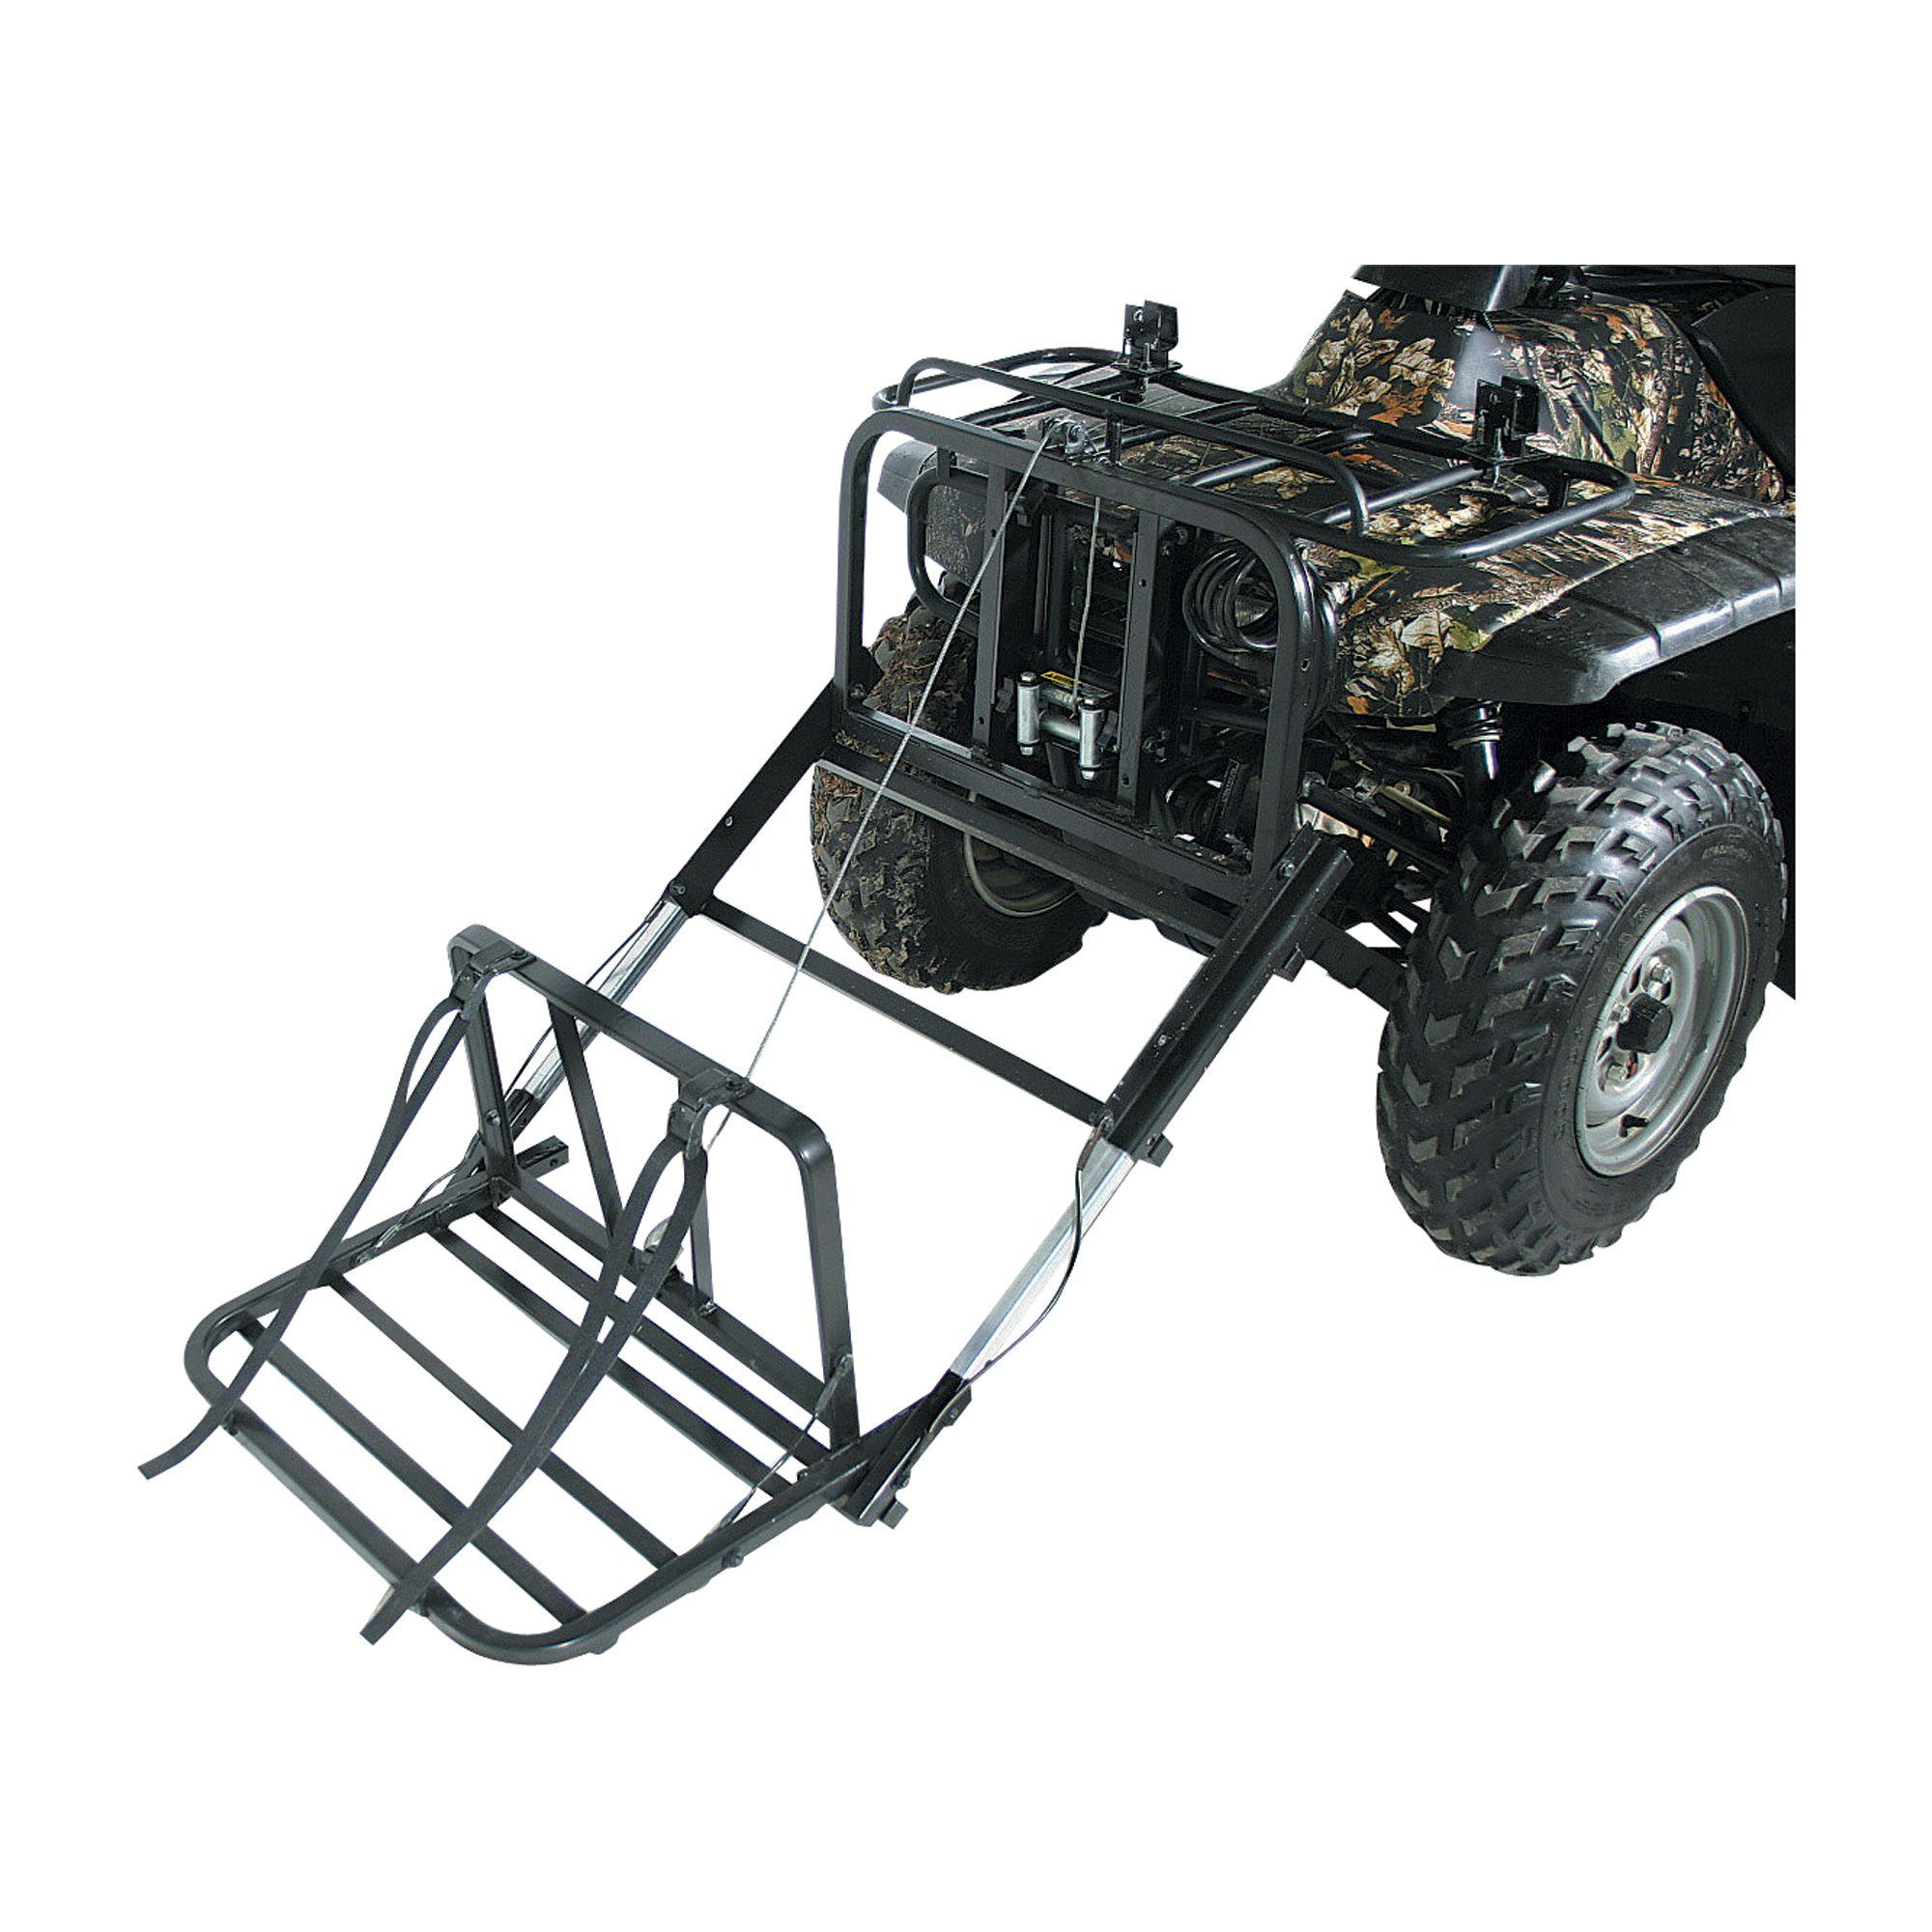 ATV Power Loader, Model# PL250   ATV Accessories  Northern Tool + Equipment